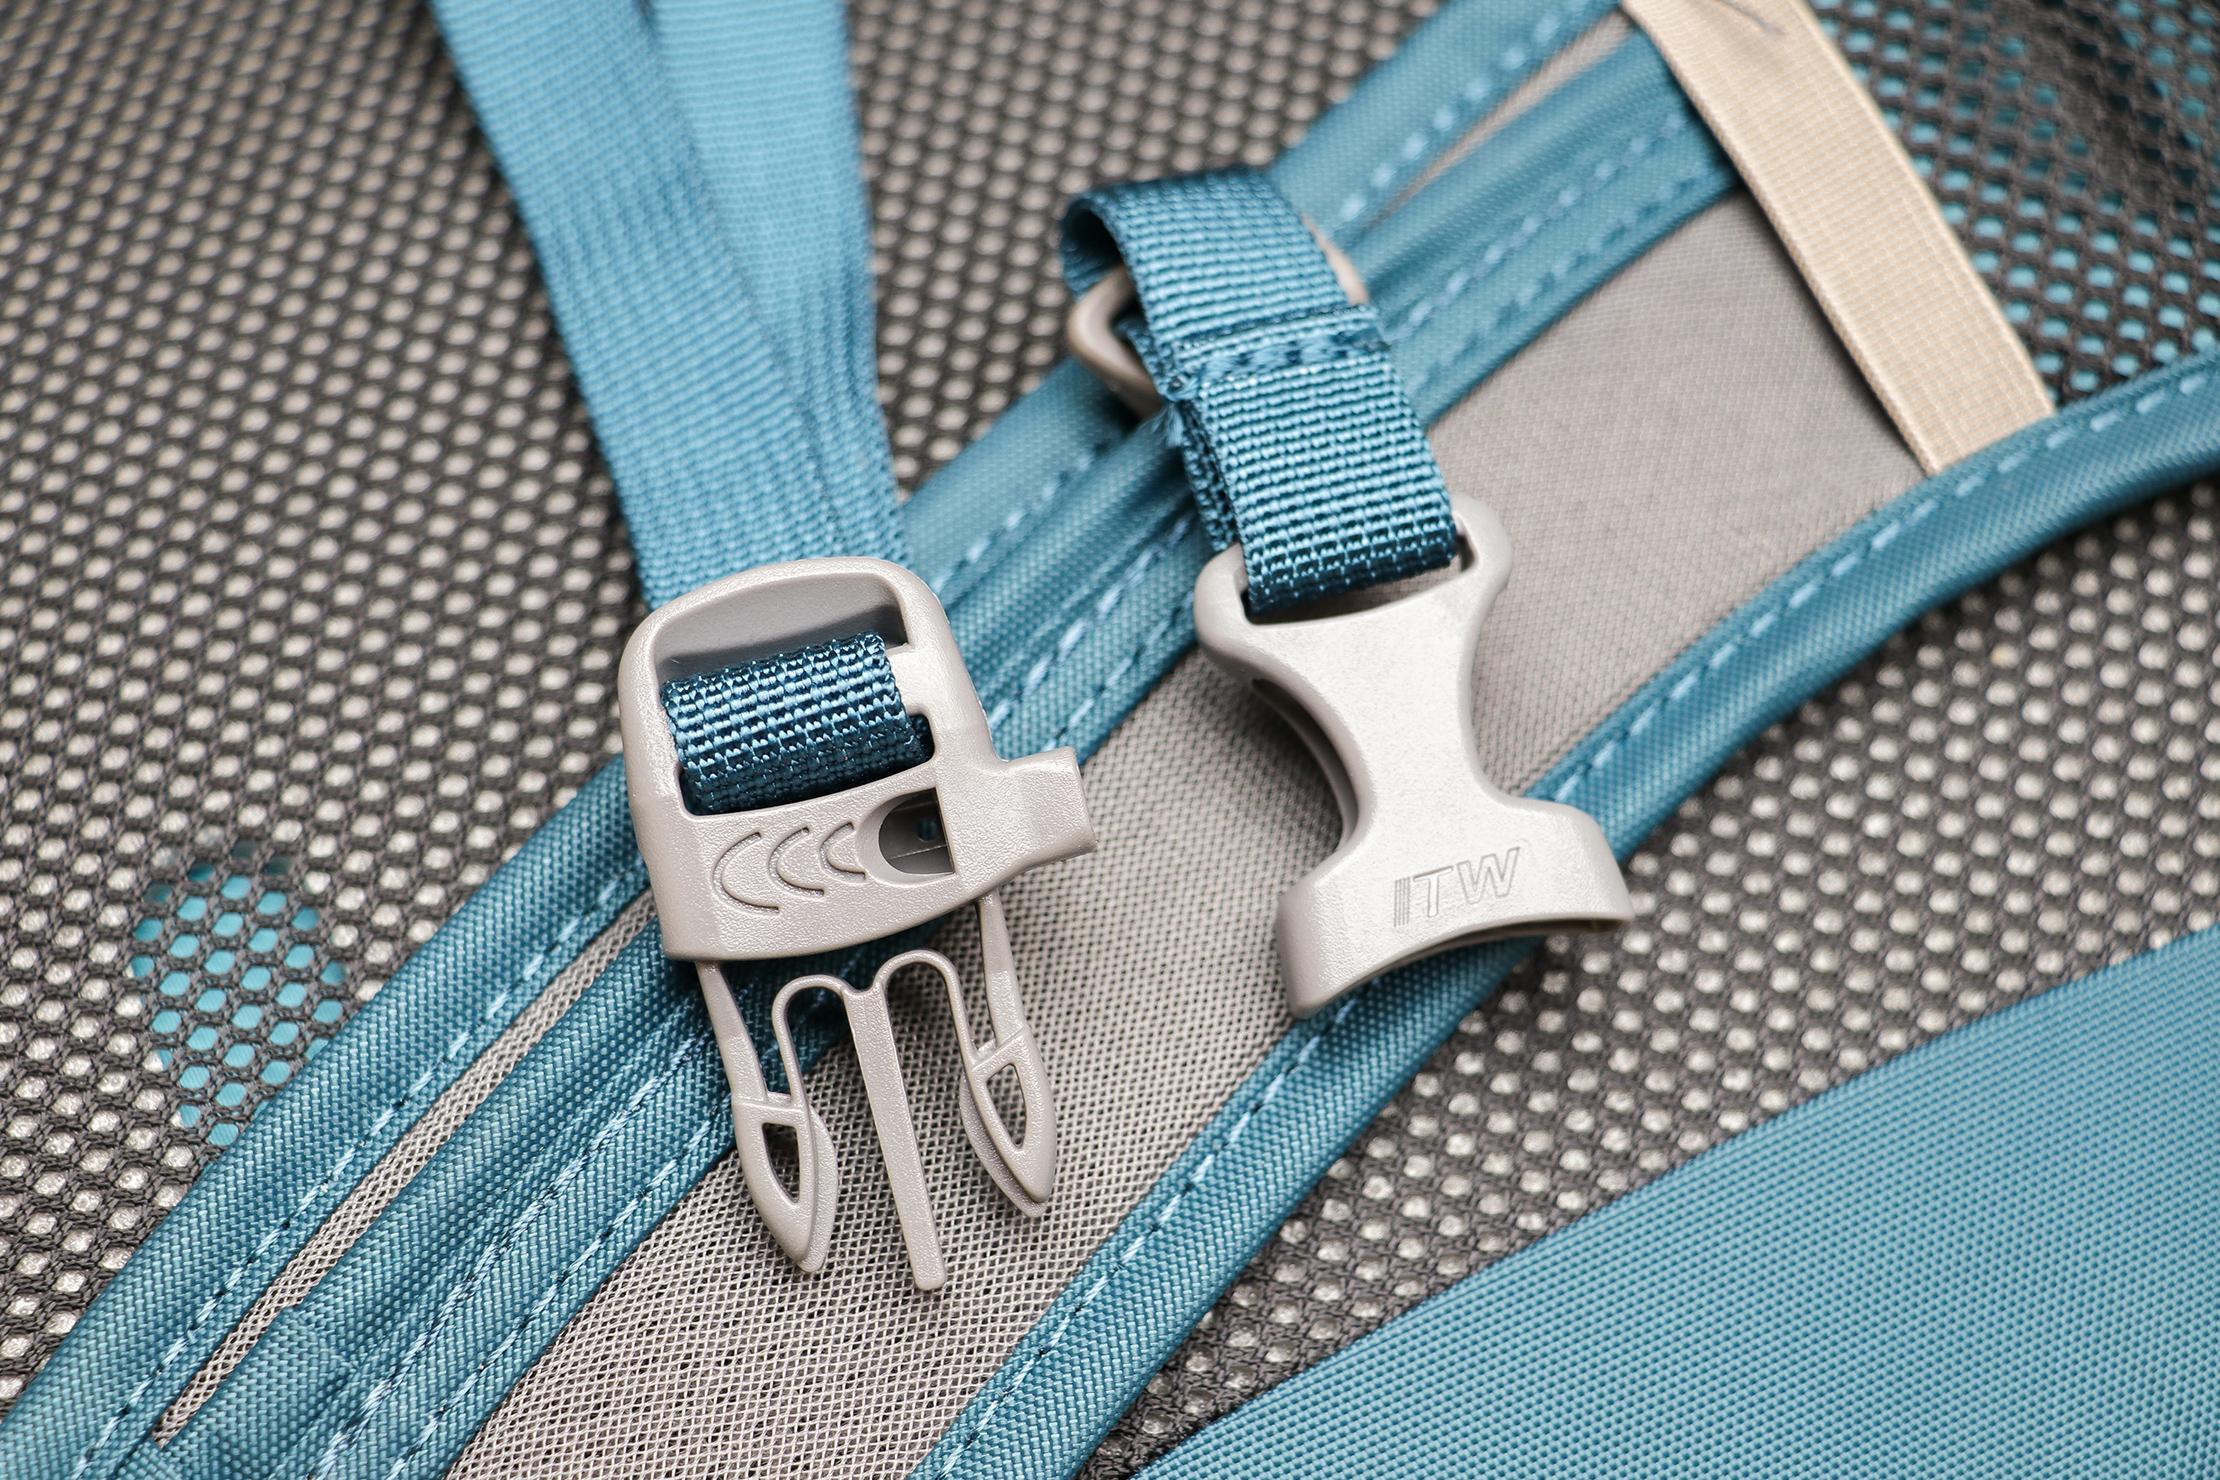 Osprey Daylite Travel Pack Buckles